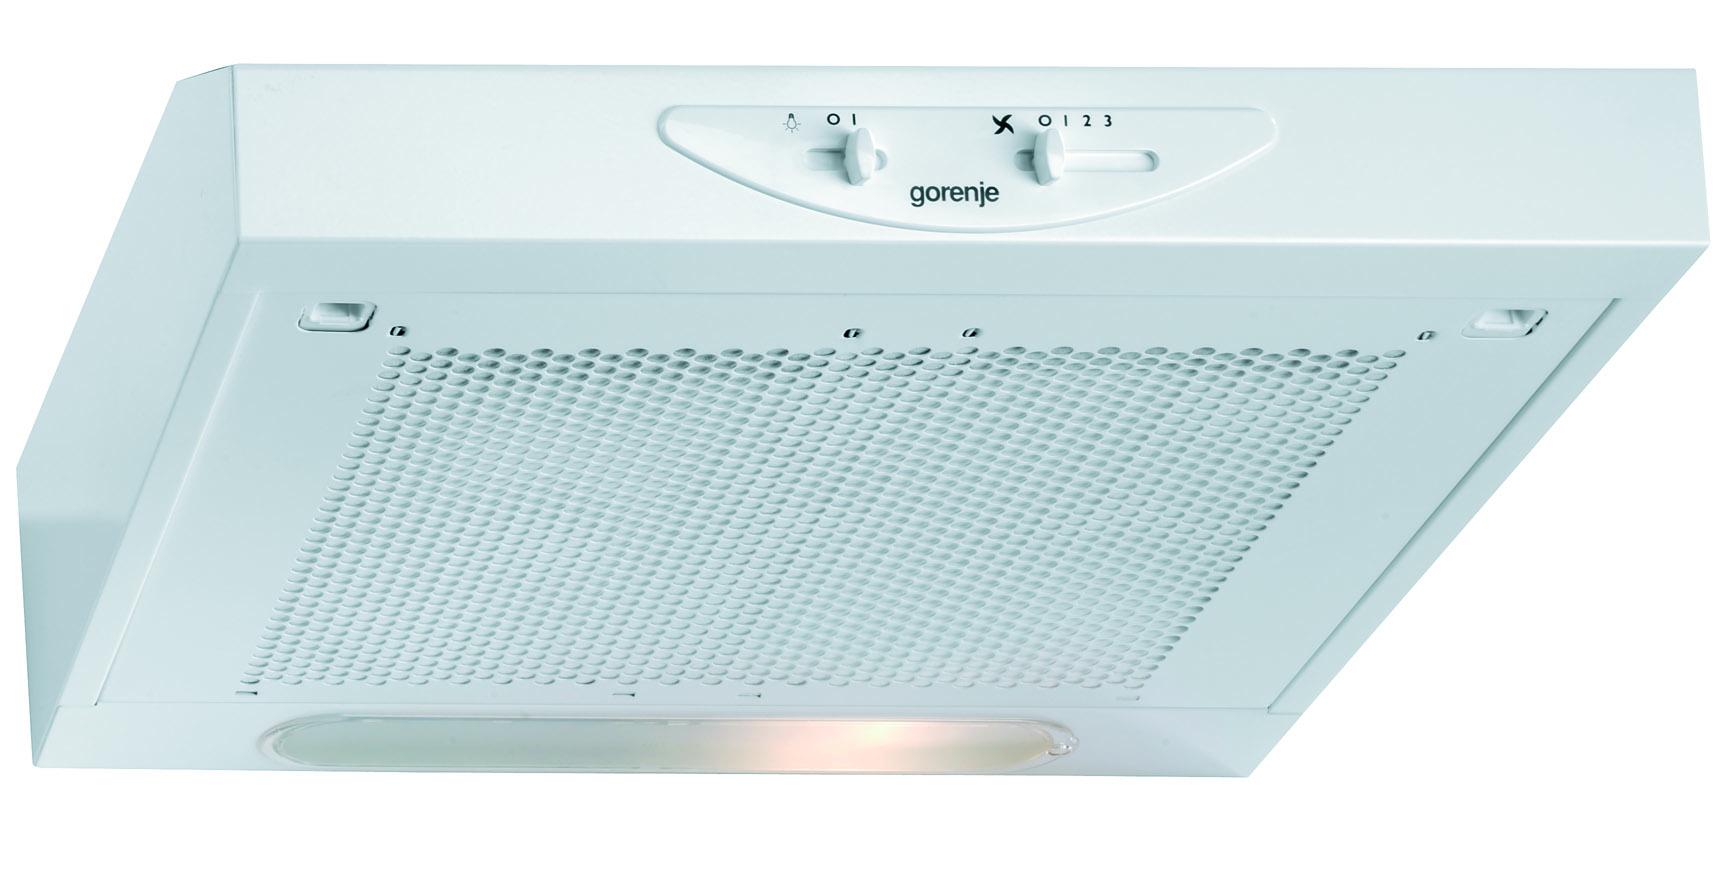 Gorenje DU511W Podugradni kuhinjski aspirator 49,9 × 13,2 × 51 cm